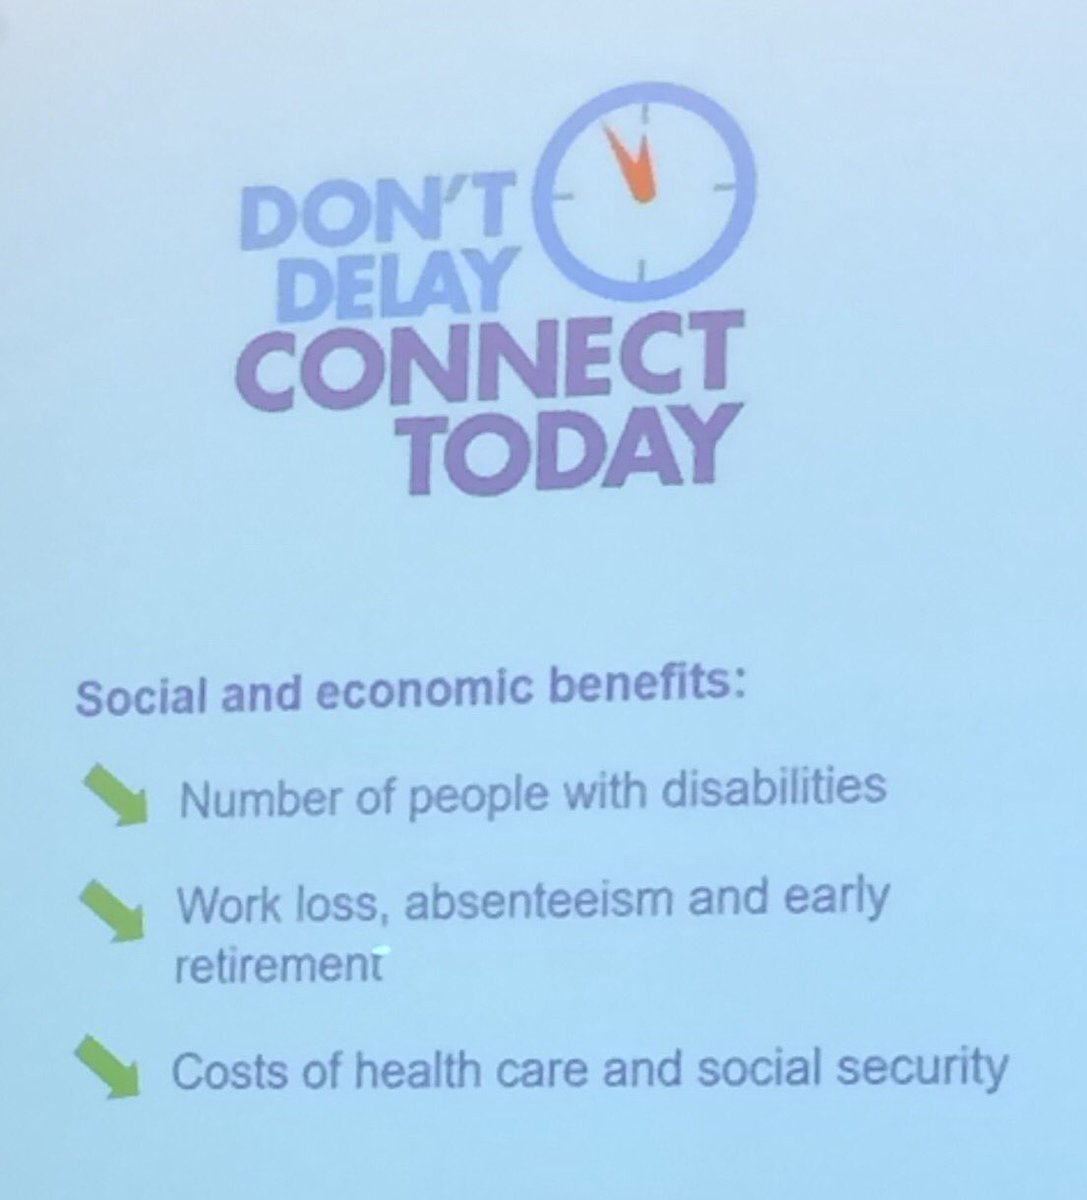 EULAR PARE CONGRES - Don't Delay, Connect Today